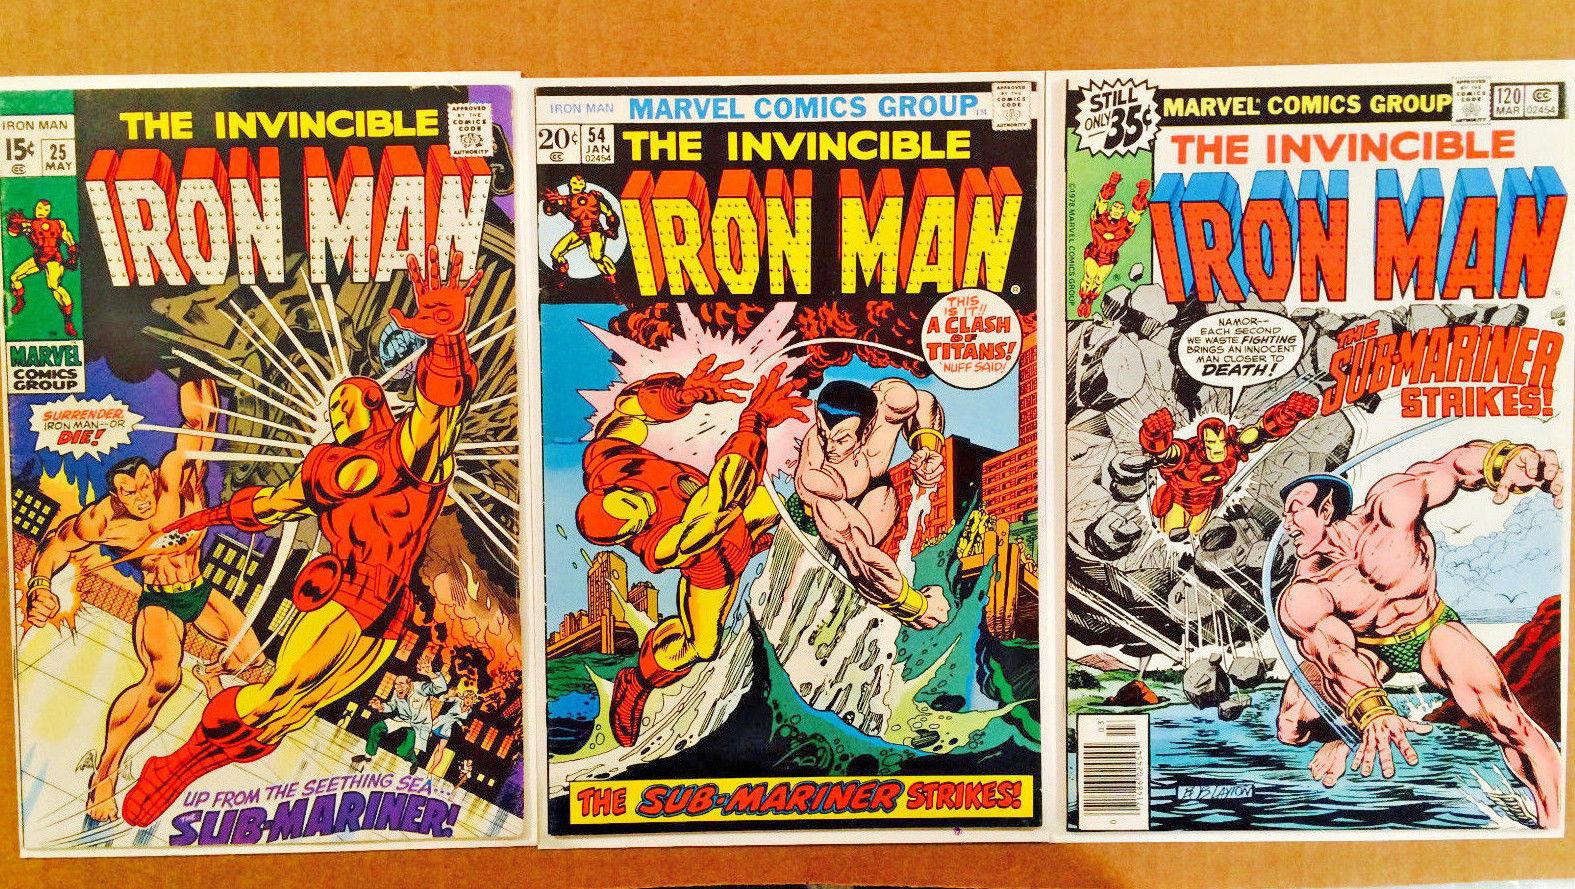 IRON MAN LOT OF 3 BRONZE-AGE COMICS #25-#54-#120